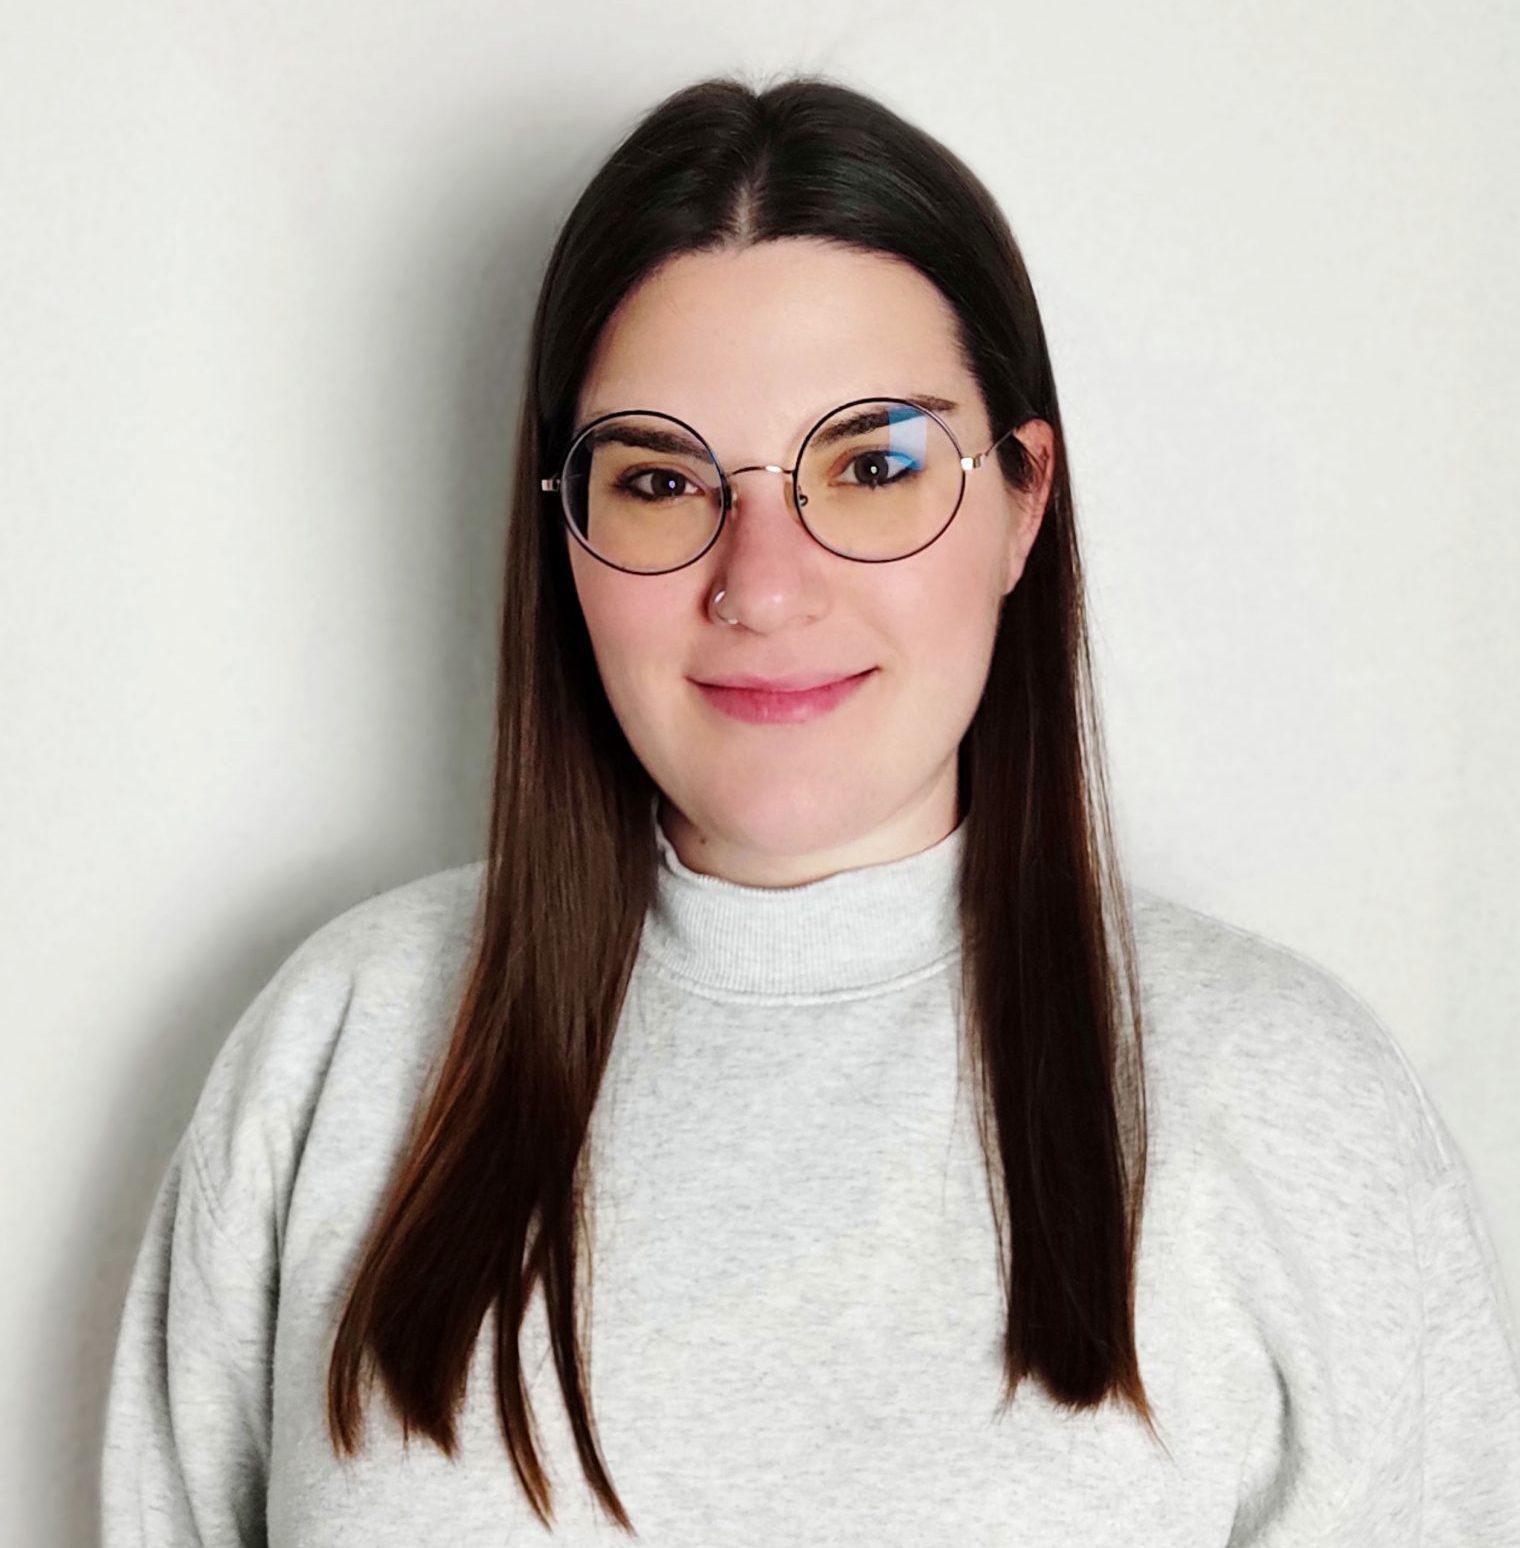 Maria-Garcia-Hernandez-marzo-2021-scaled-e1617030297311